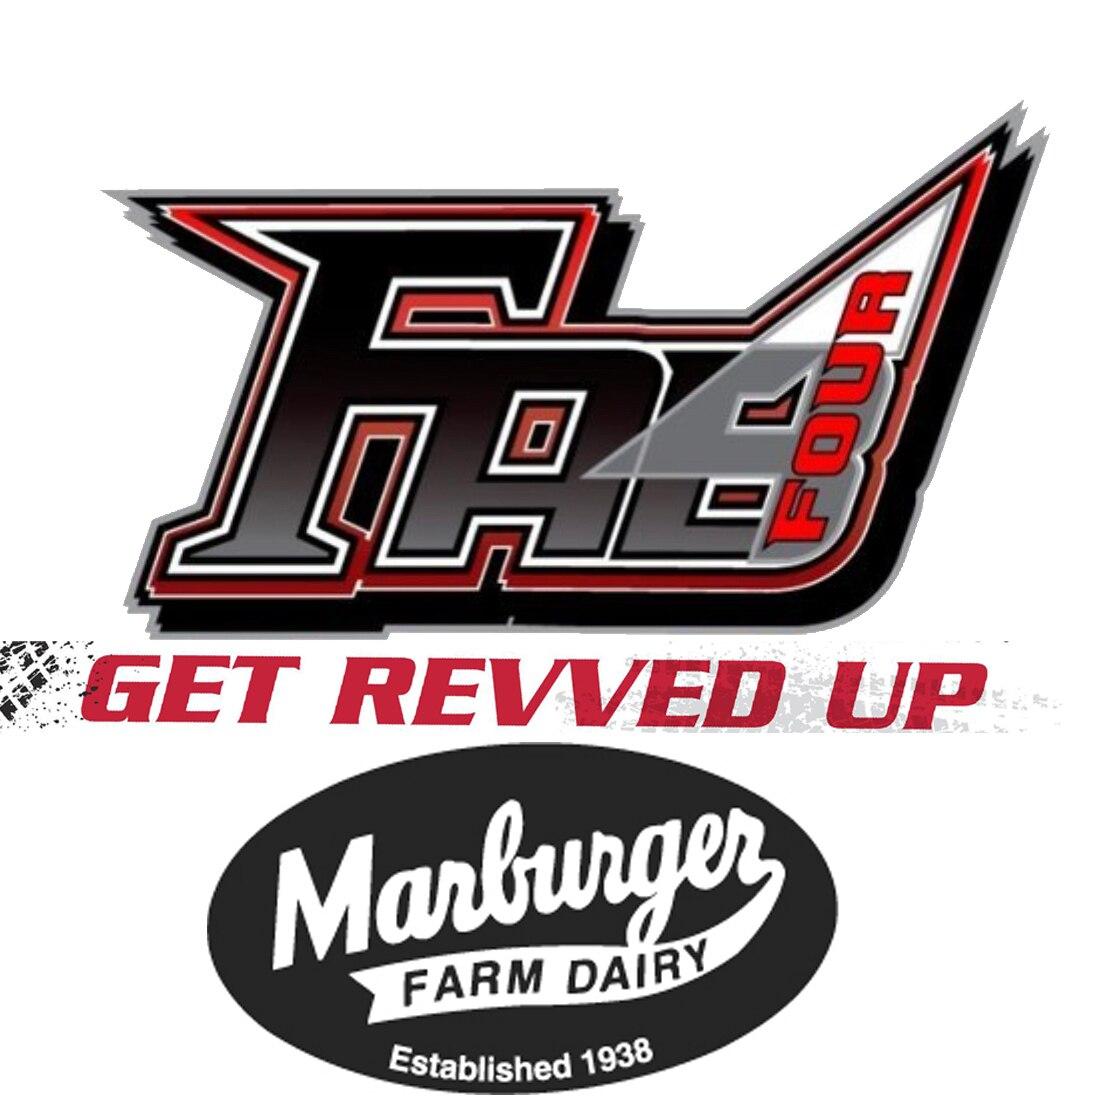 fab4-marburger.jpg